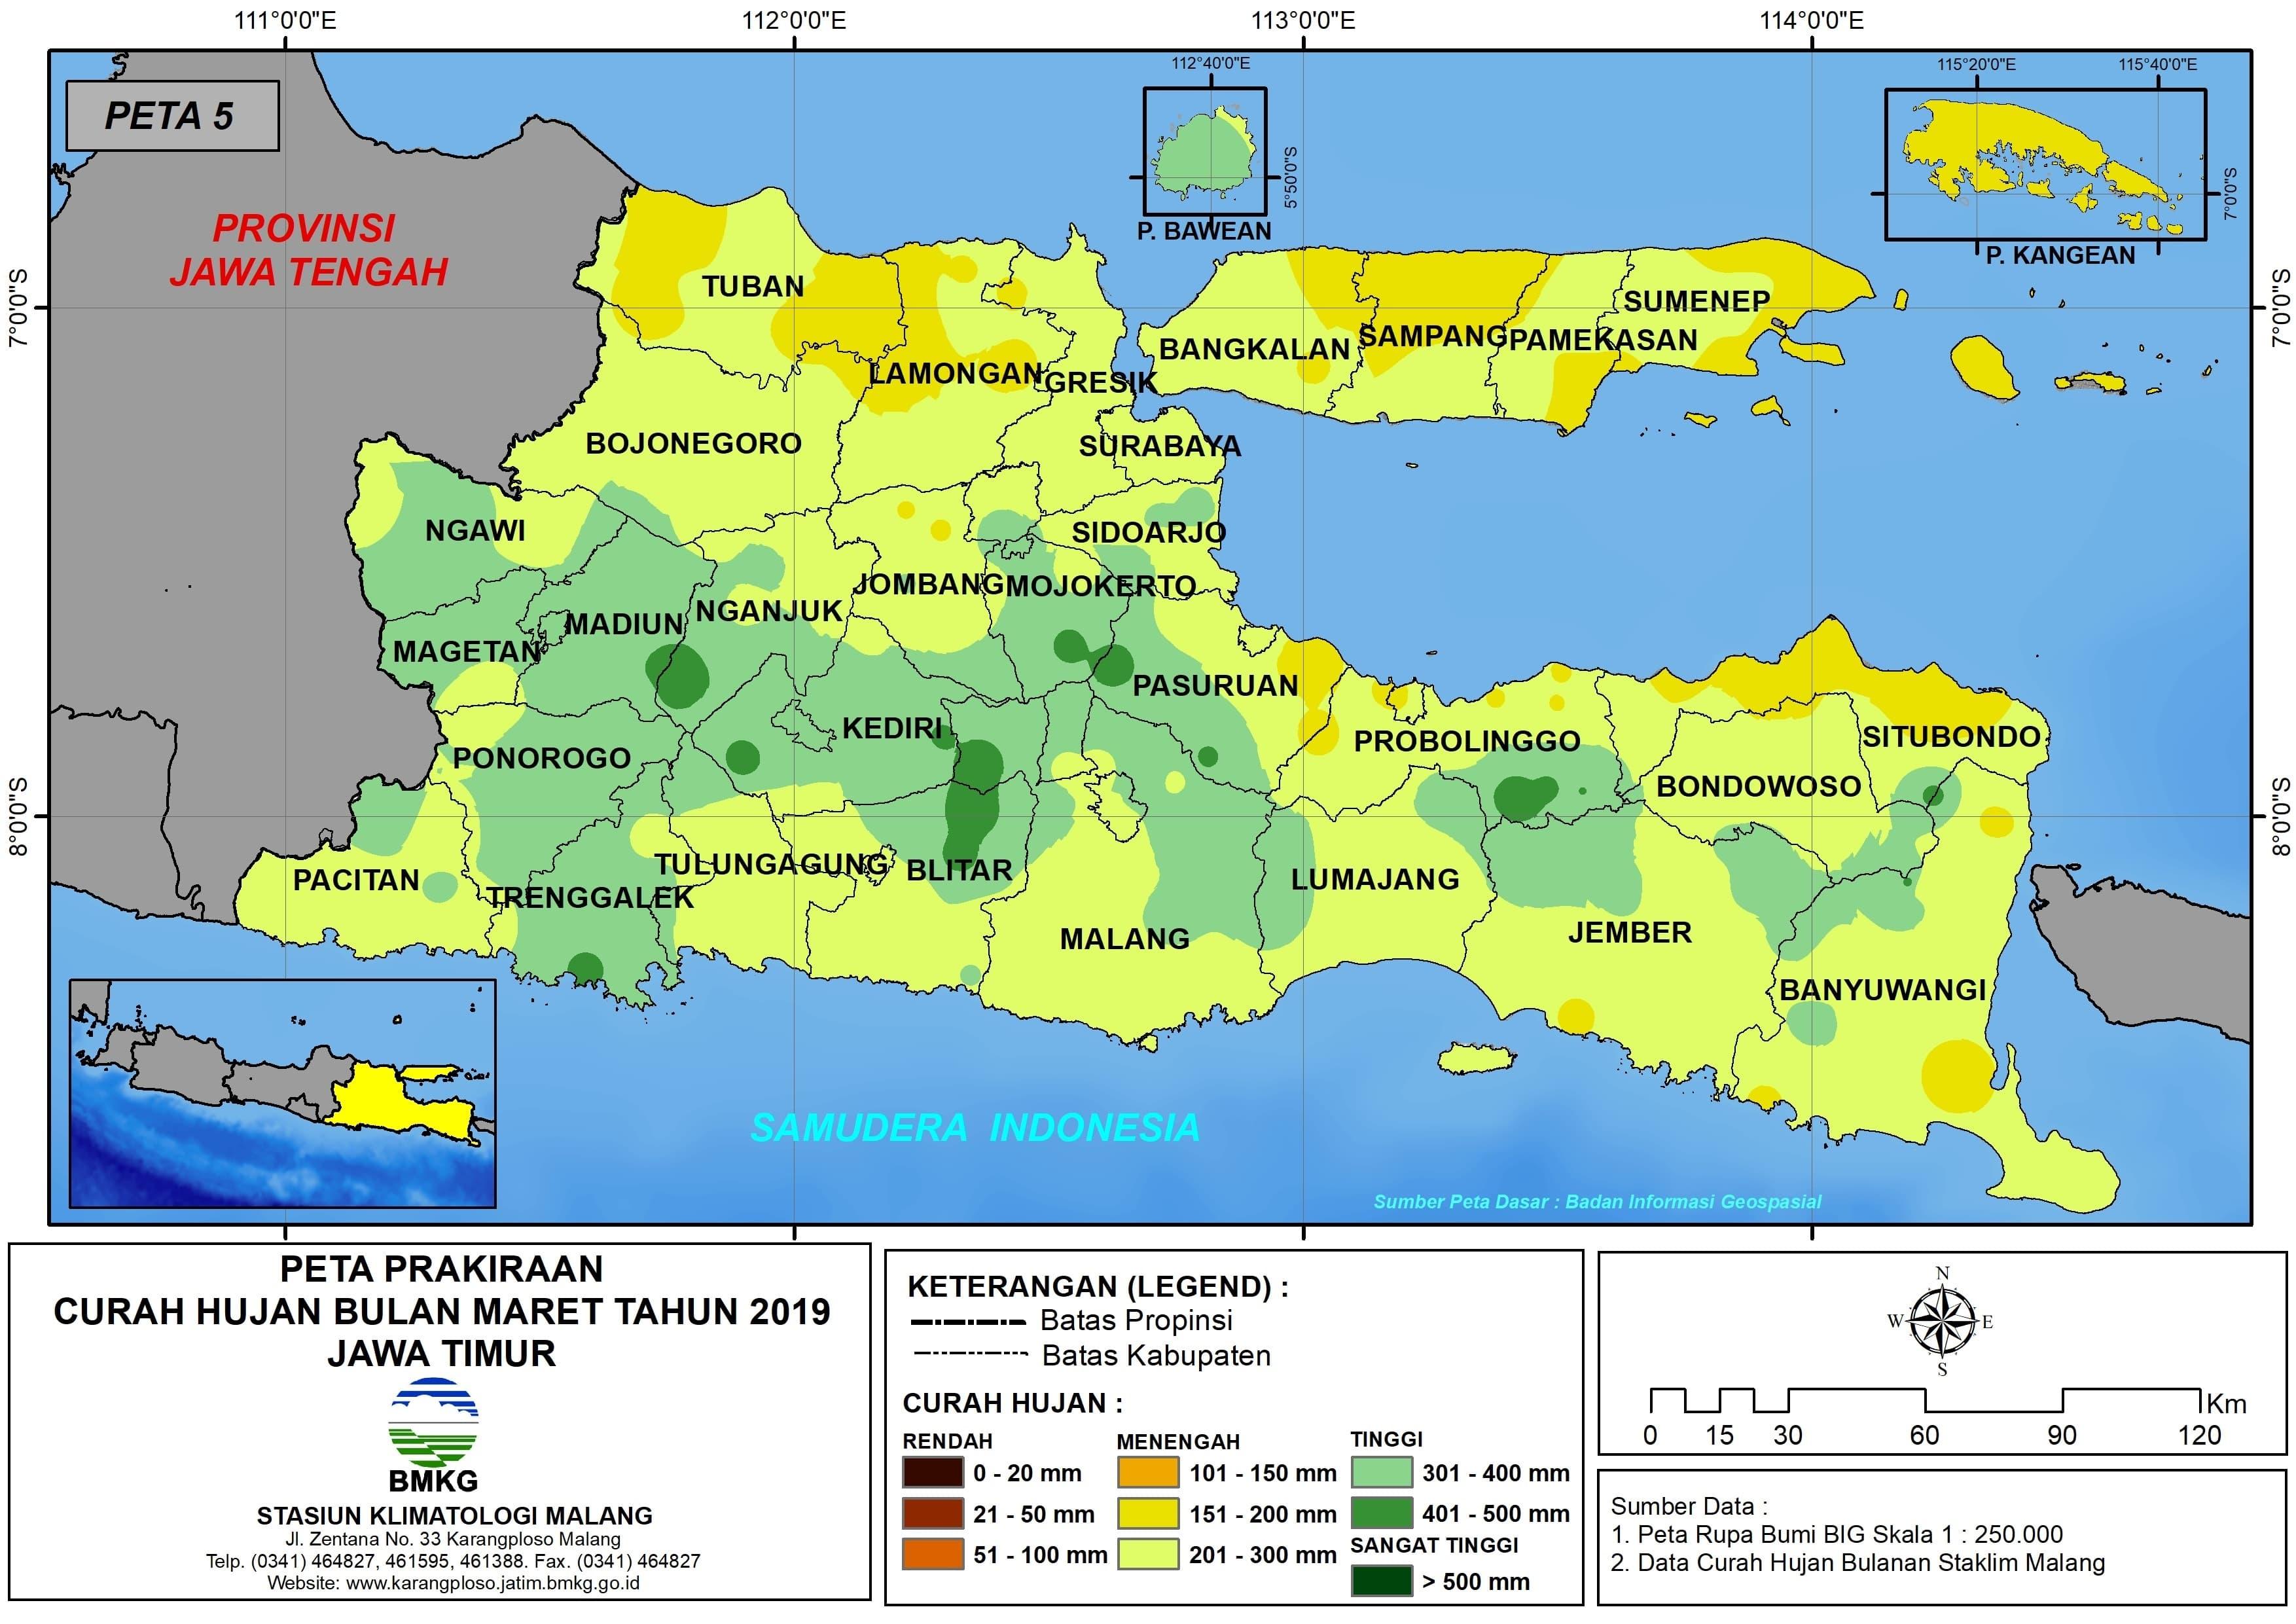 Prakiraan Curah Hujan Bulan Maret Tahun 2019 di Provinsi Jawa Timur Update dari Analisis Bulan Januari 2019